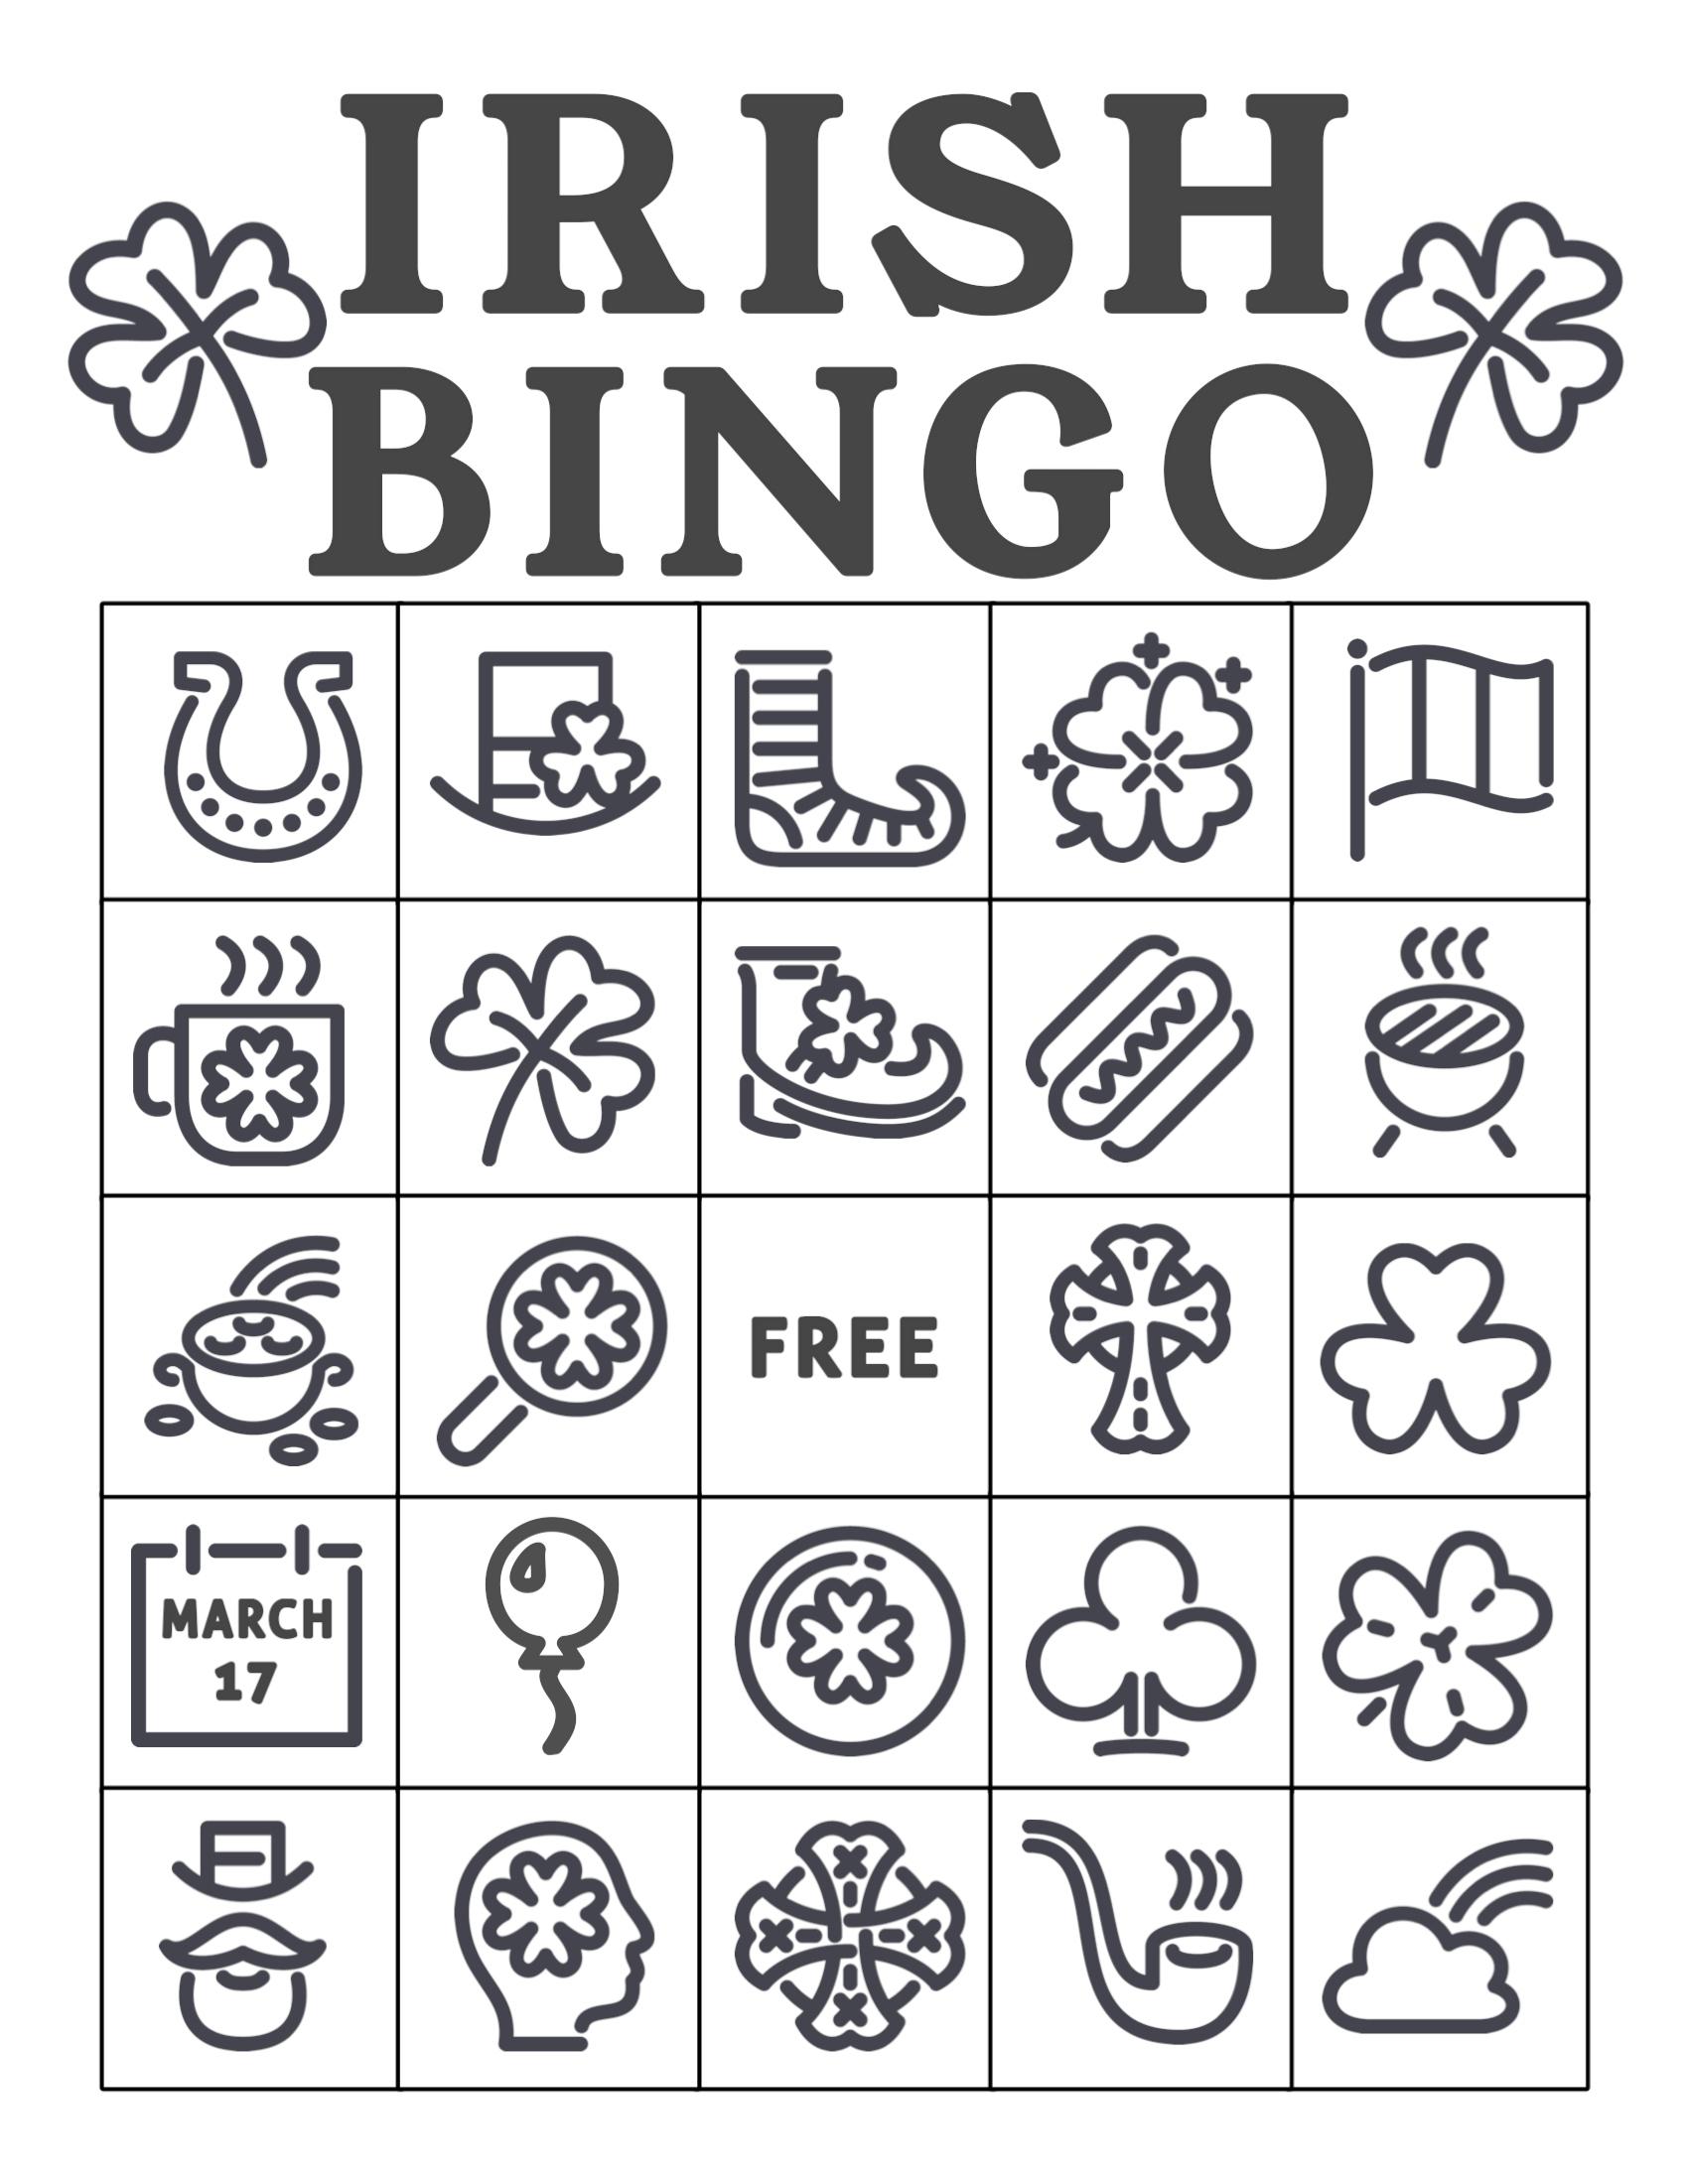 Free Printable St. Patrick's Day Bingo Cards - Paper Trail